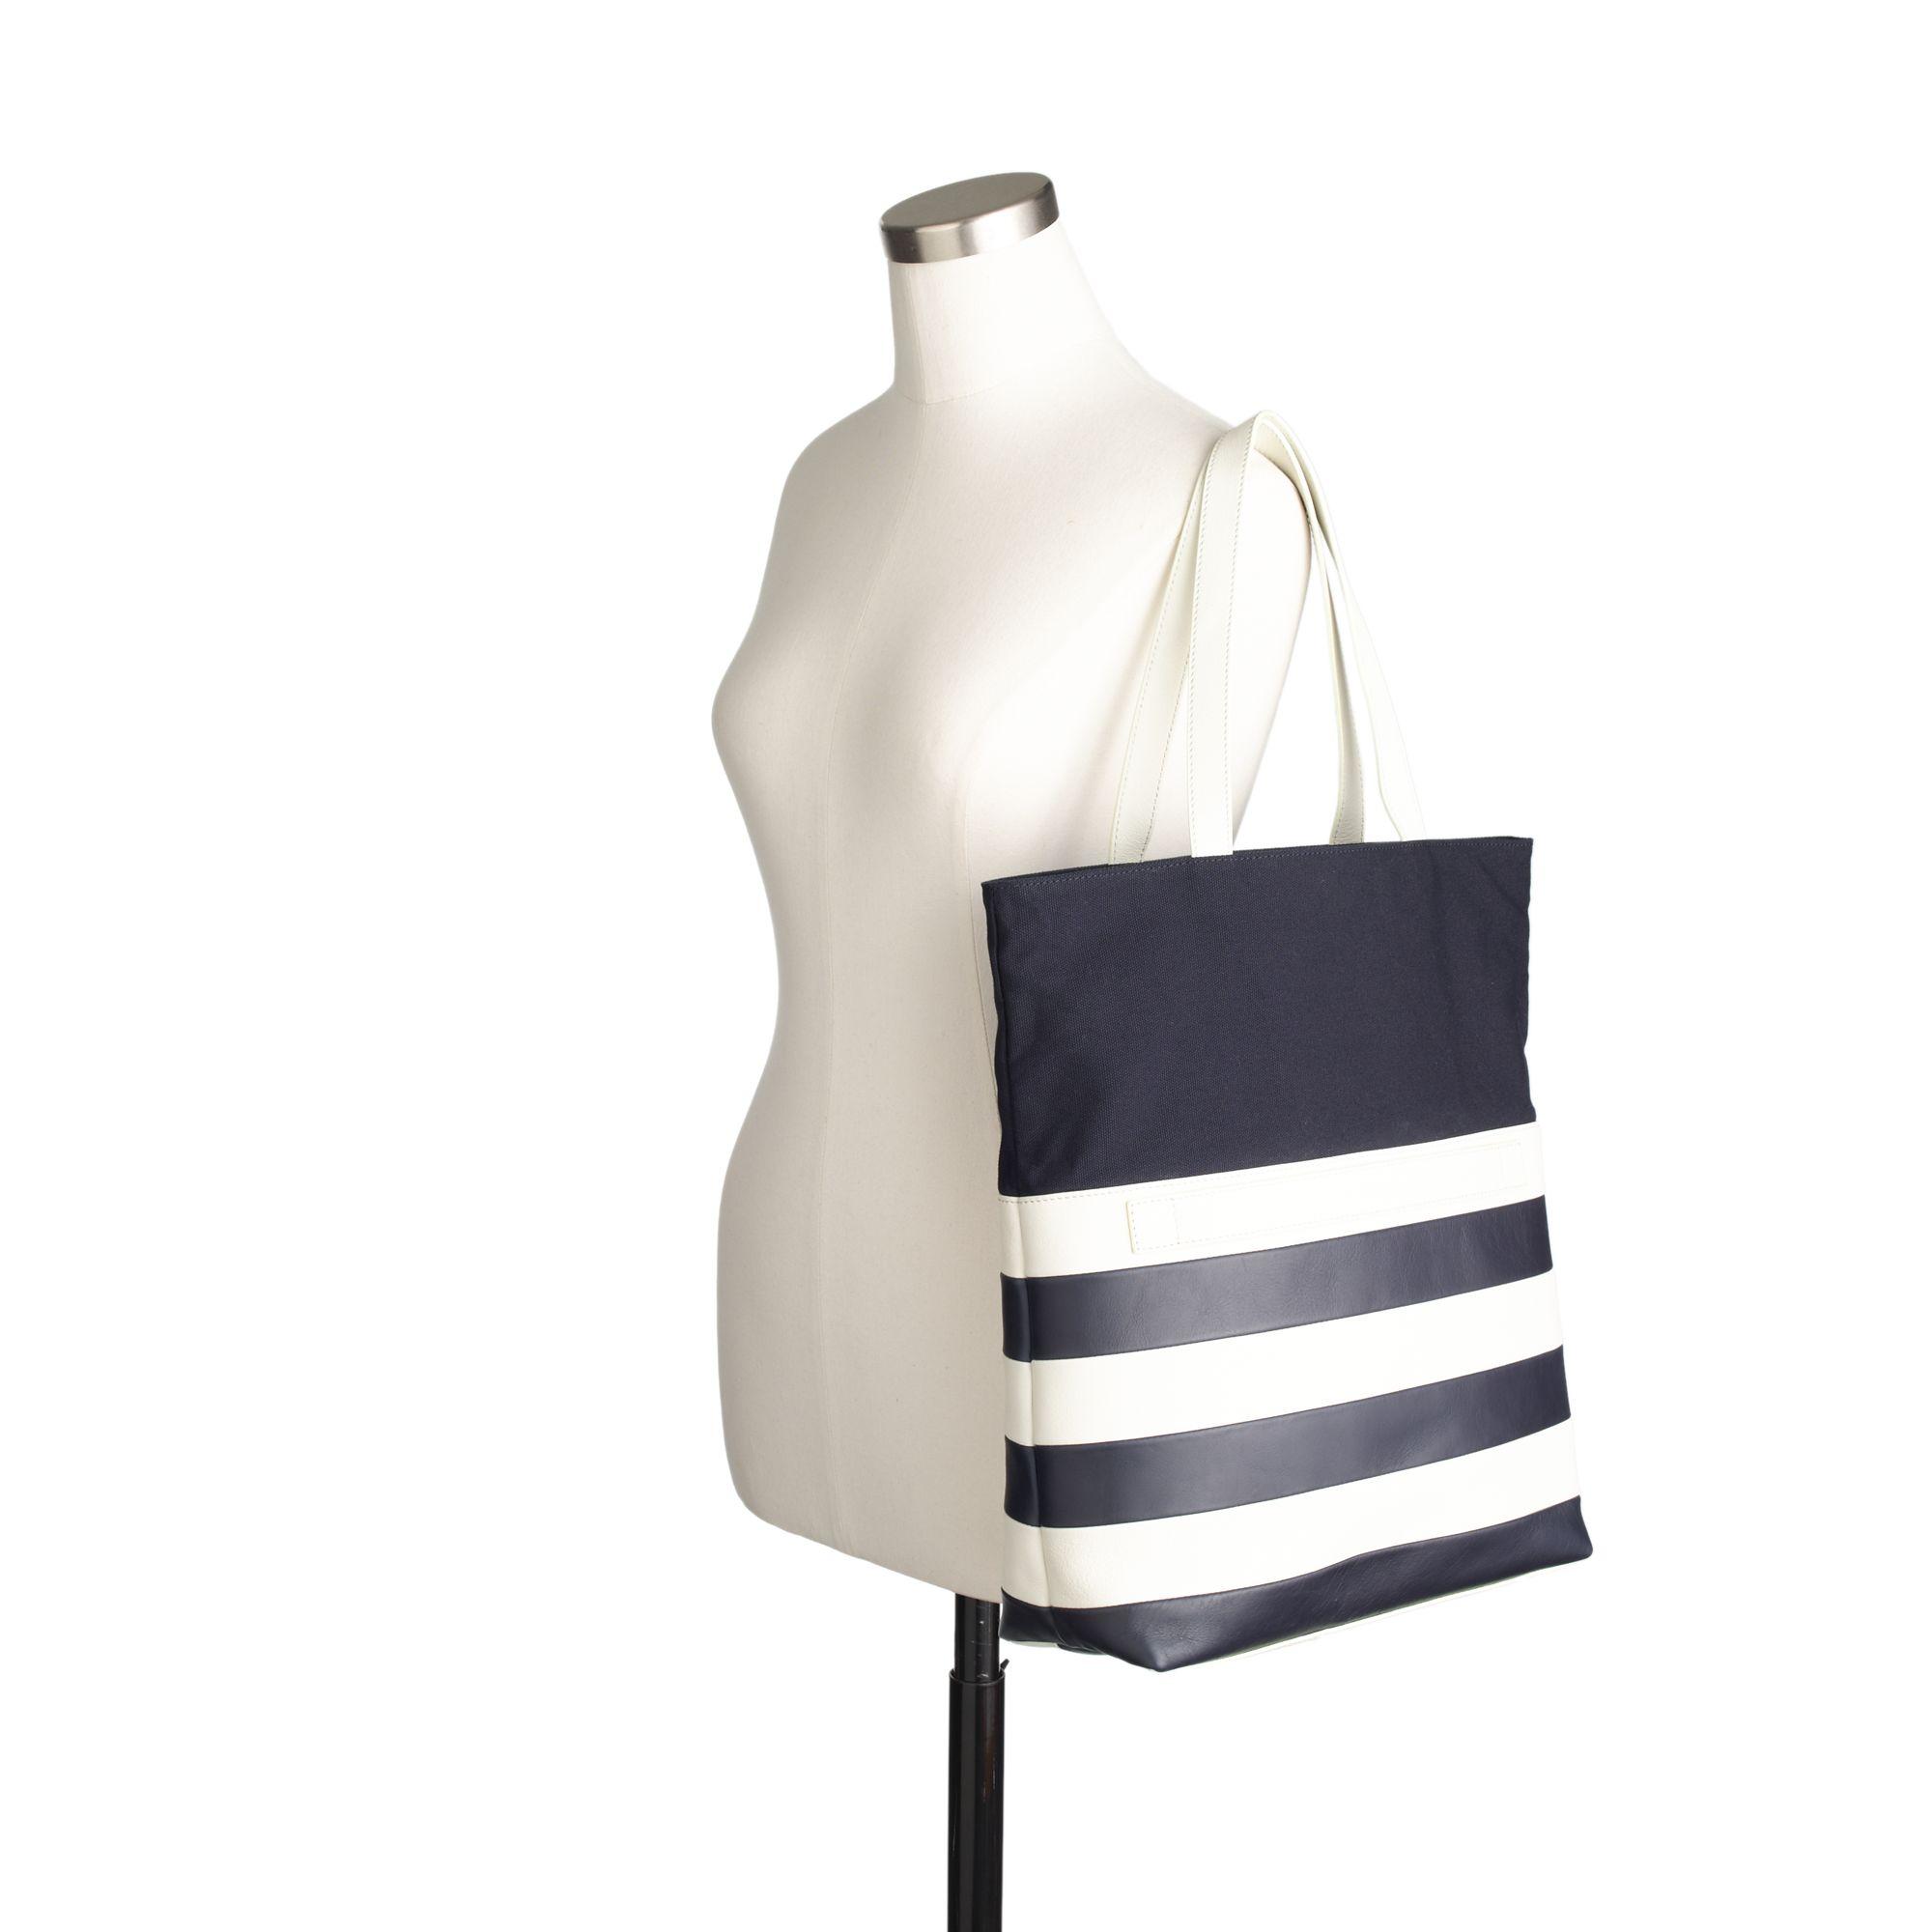 J.Crew Want Les Essentiels De La Vie For Stripe Medium Twoway Tote in Navy White Stripe (Blue)